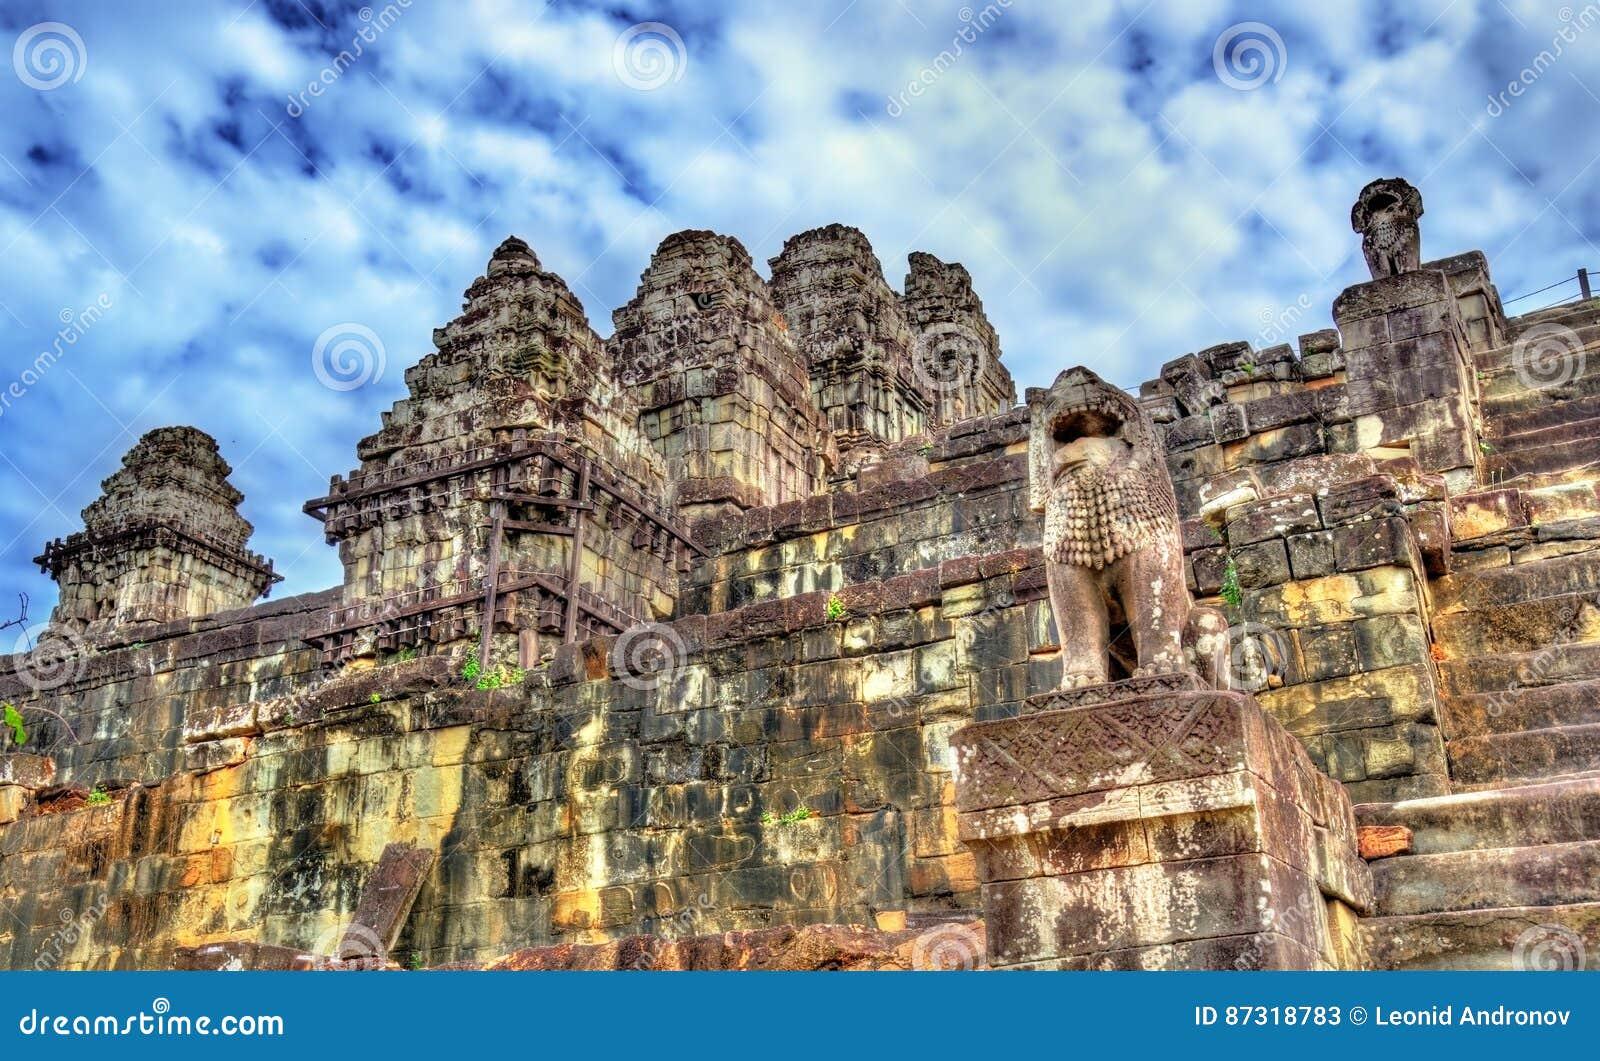 hindu temple phnom bakheng  angkor  cambodia stock photography cartoondealer com 17200292 clip art mountain dew clip art mountain range